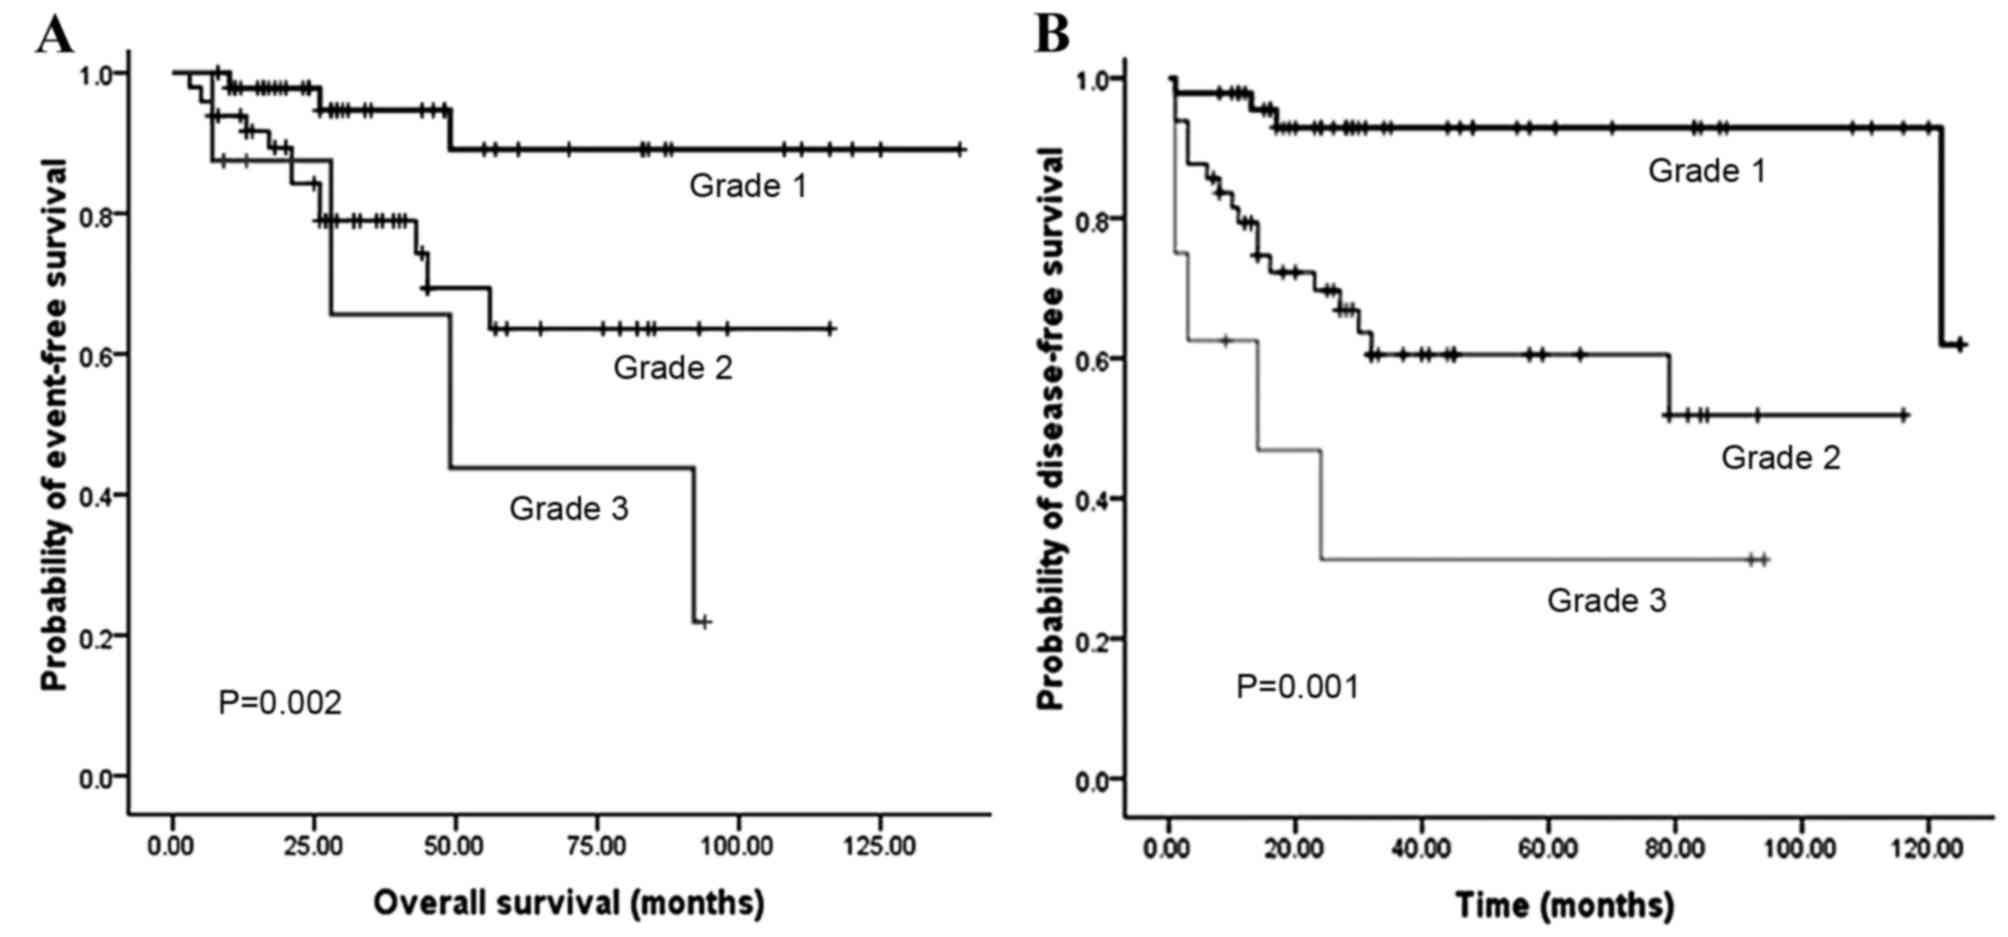 Neuroendocrine cancer survival rate. Neuroendocrine cancer survival rate